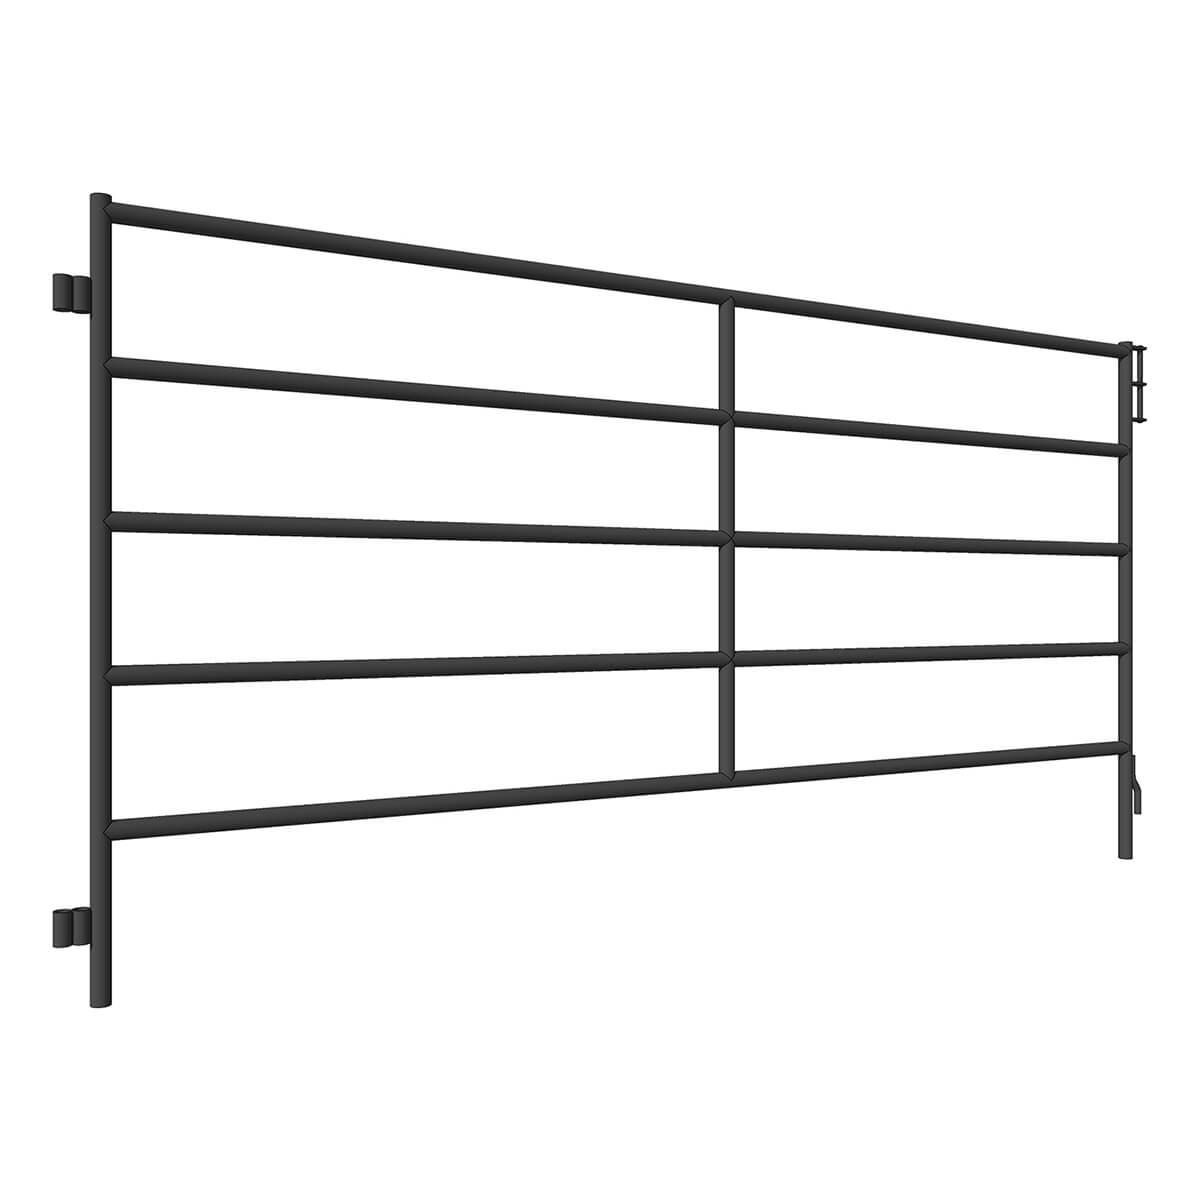 Lemsco Panel - 10-ft